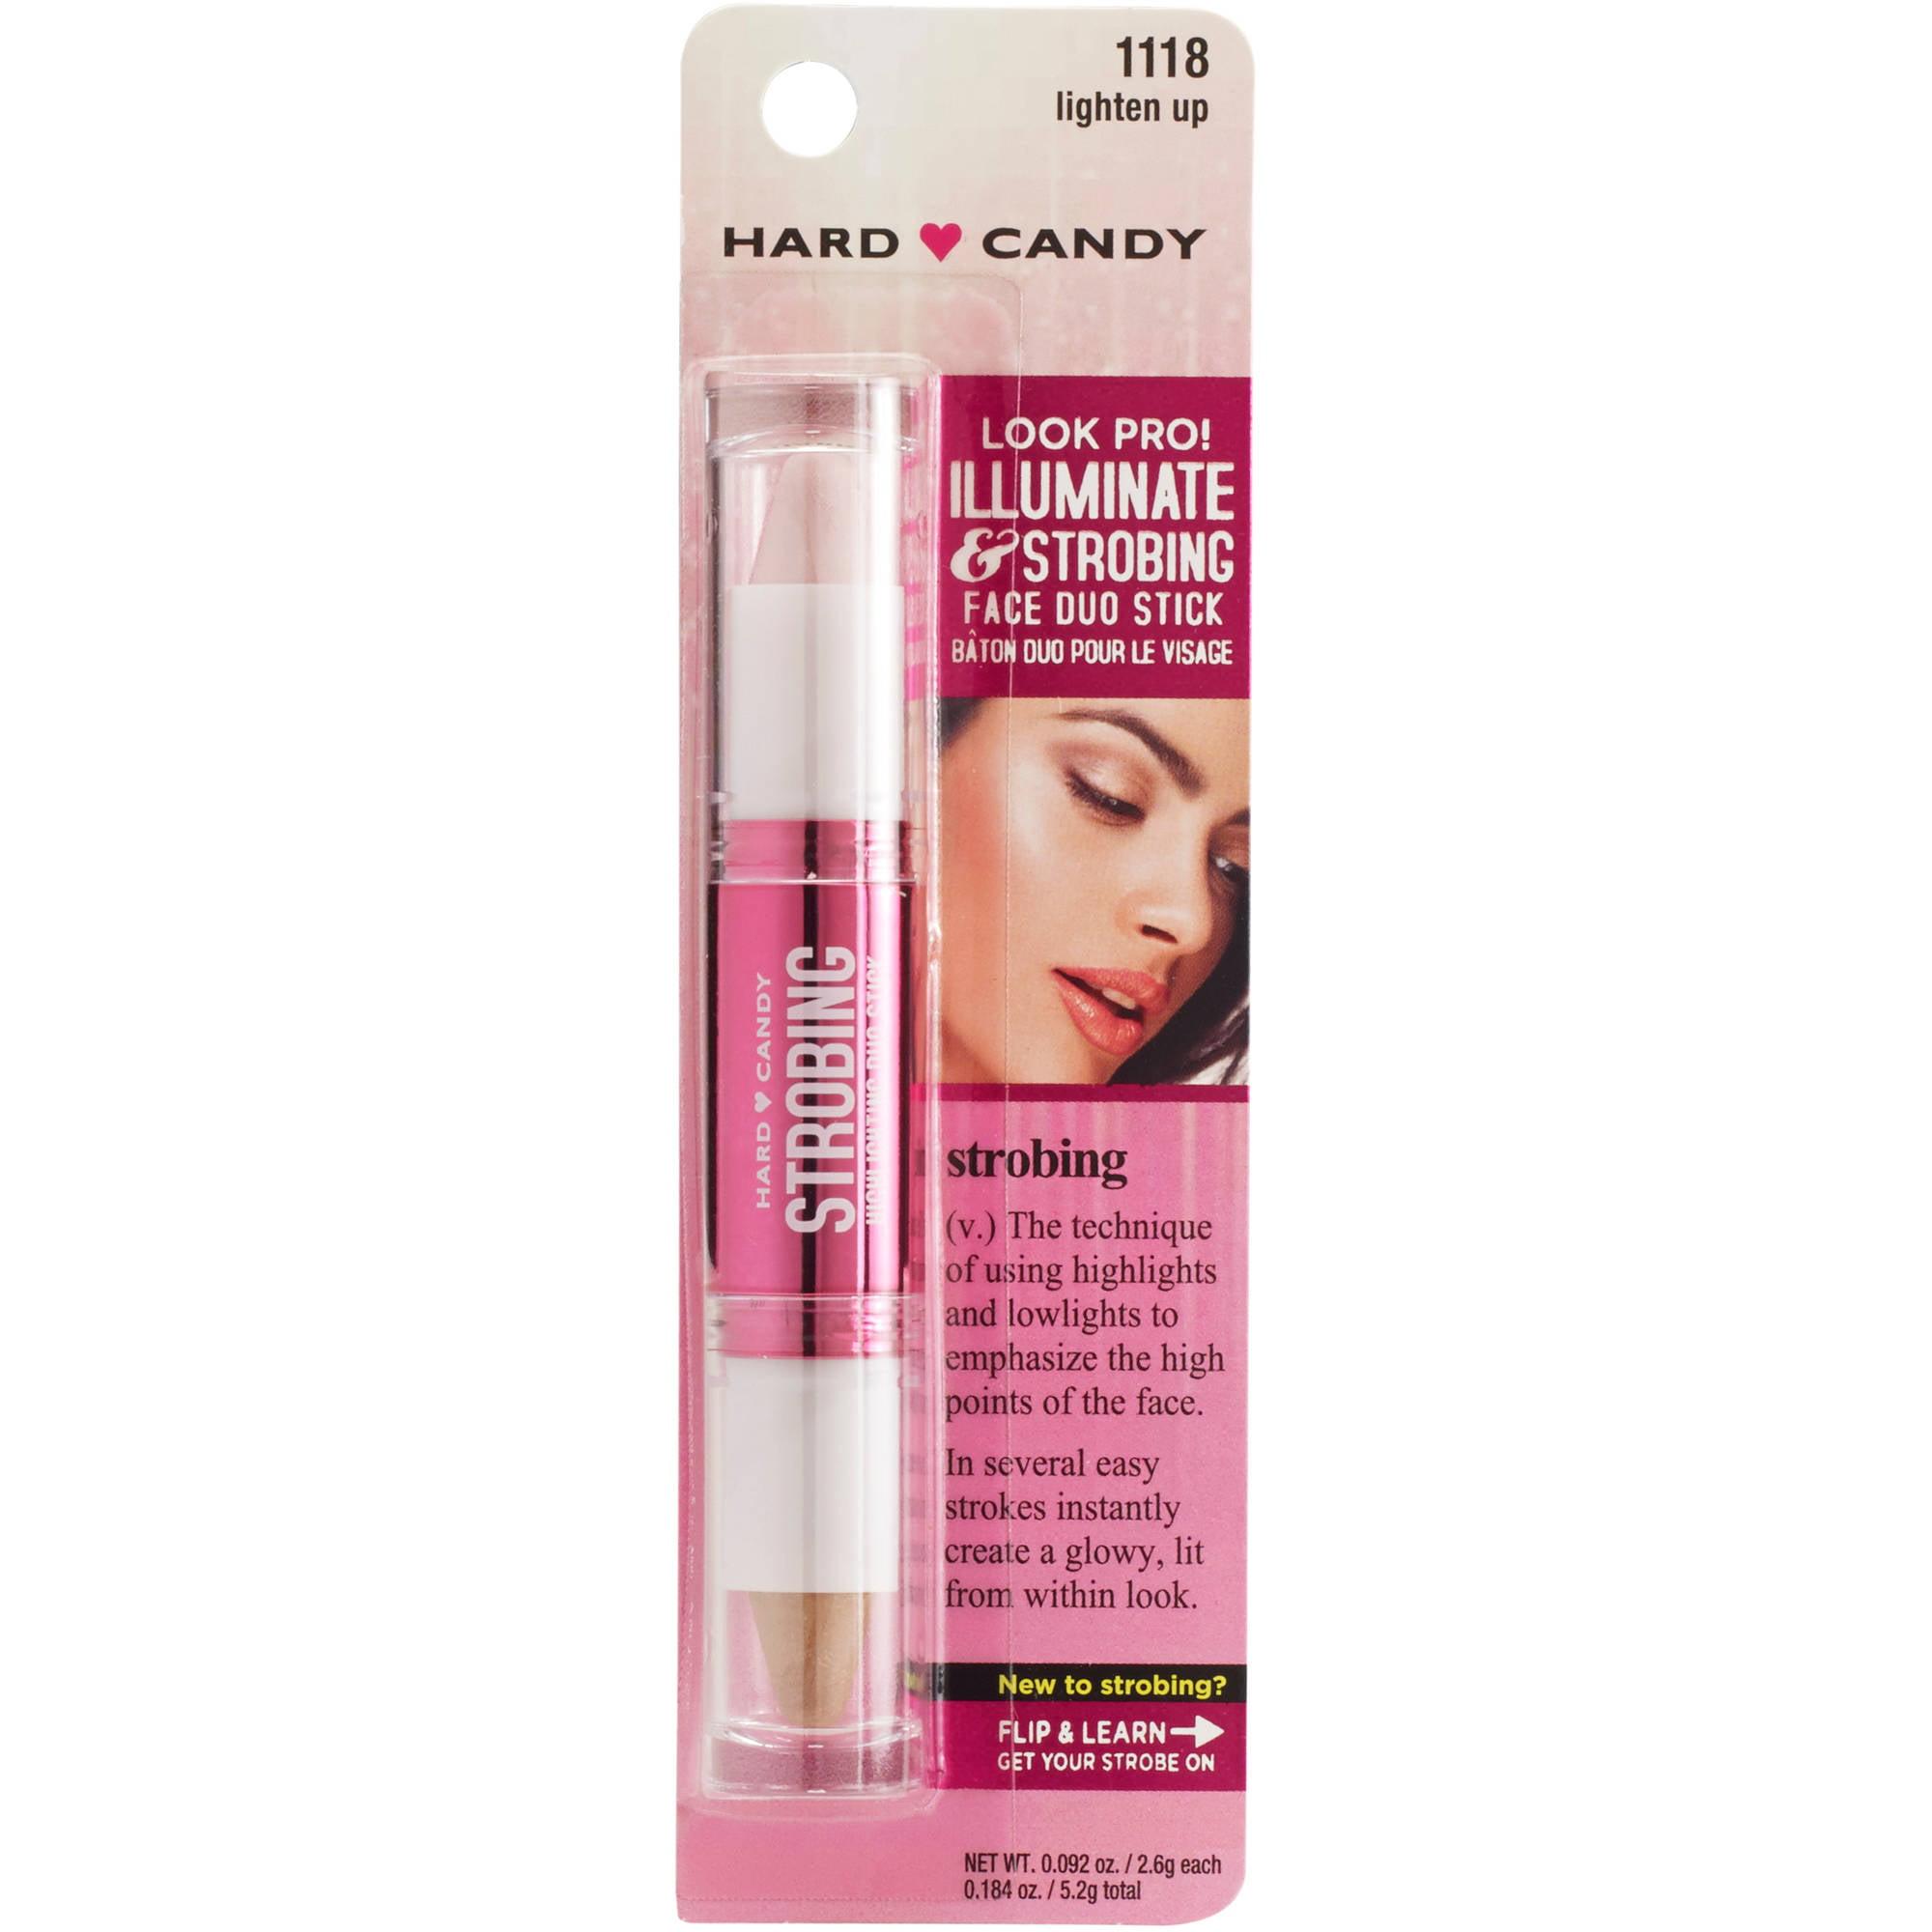 Hard Candy Look Pro! Illuminate & Strobing Face Duo Stick, 1118 Lighten Up, 0.092 oz